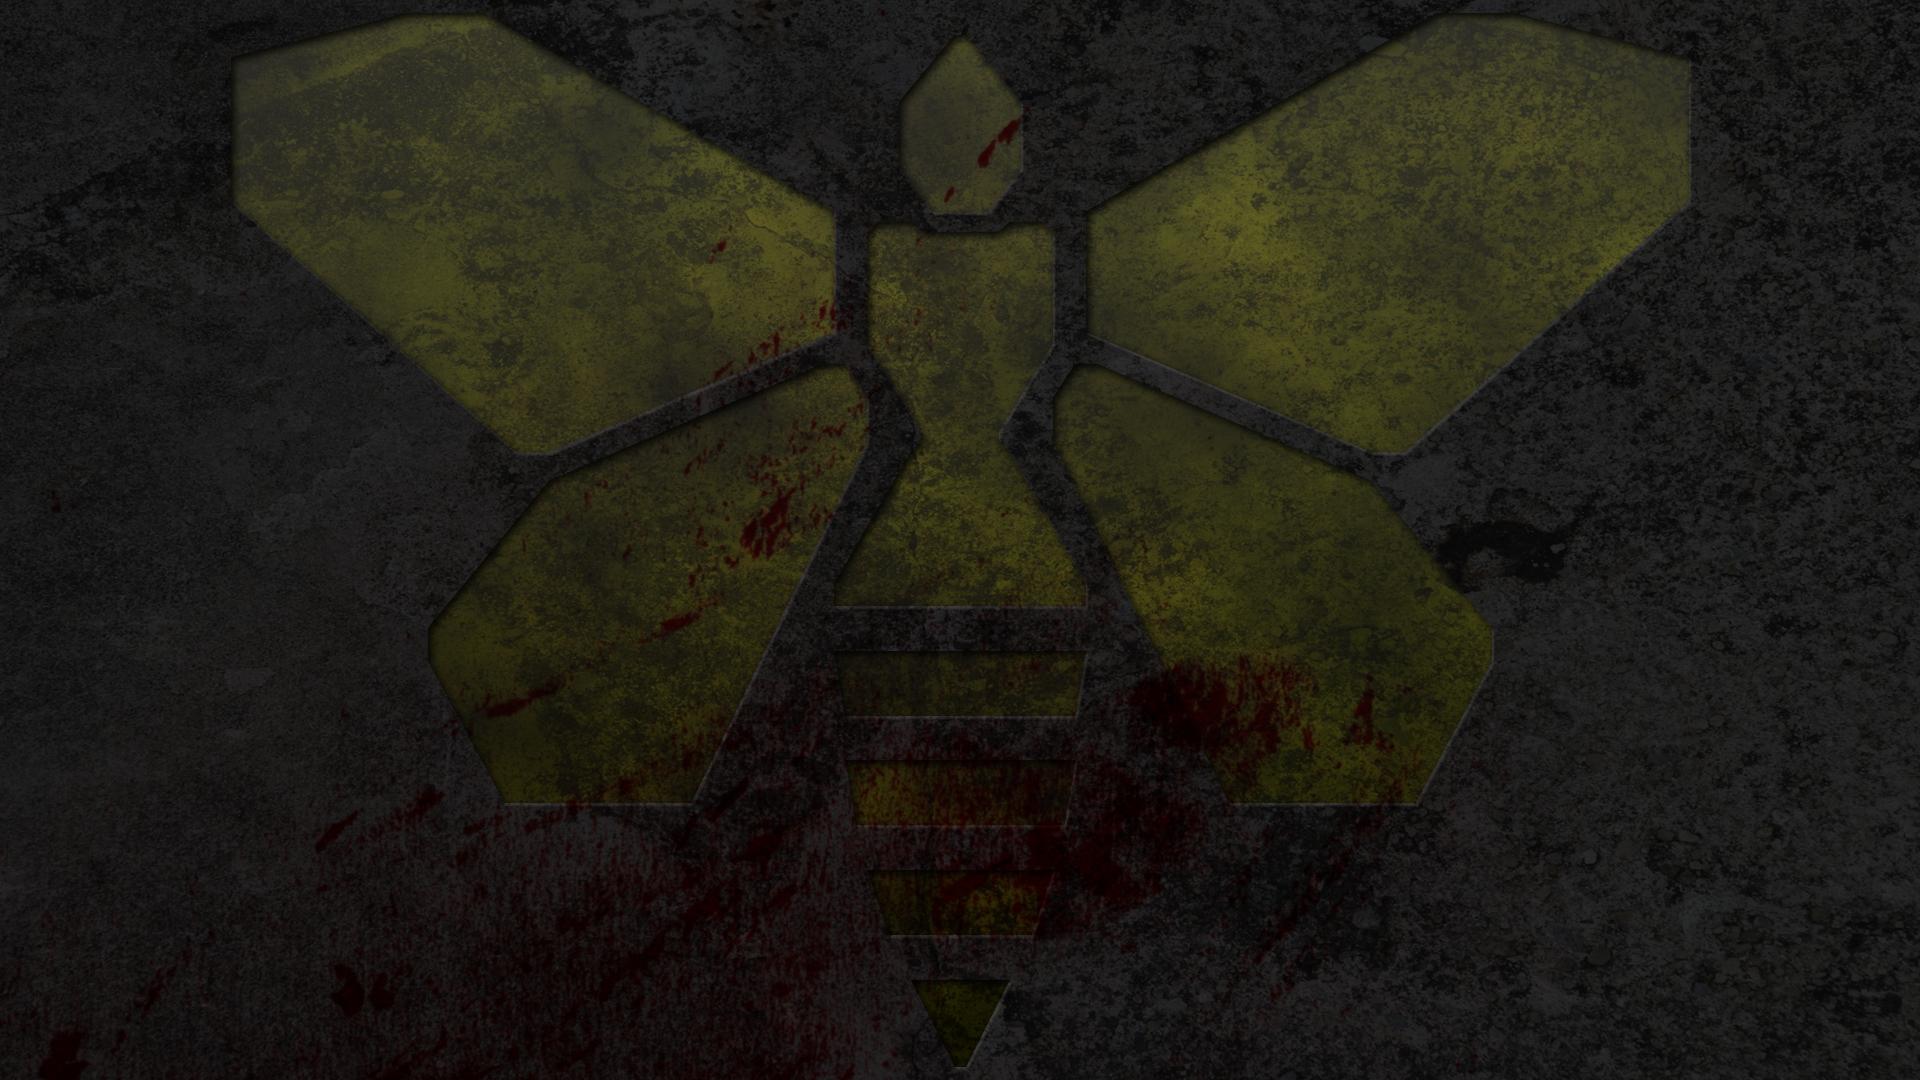 wallpaper : blood, grunge, breaking bad, surface, texture, dark